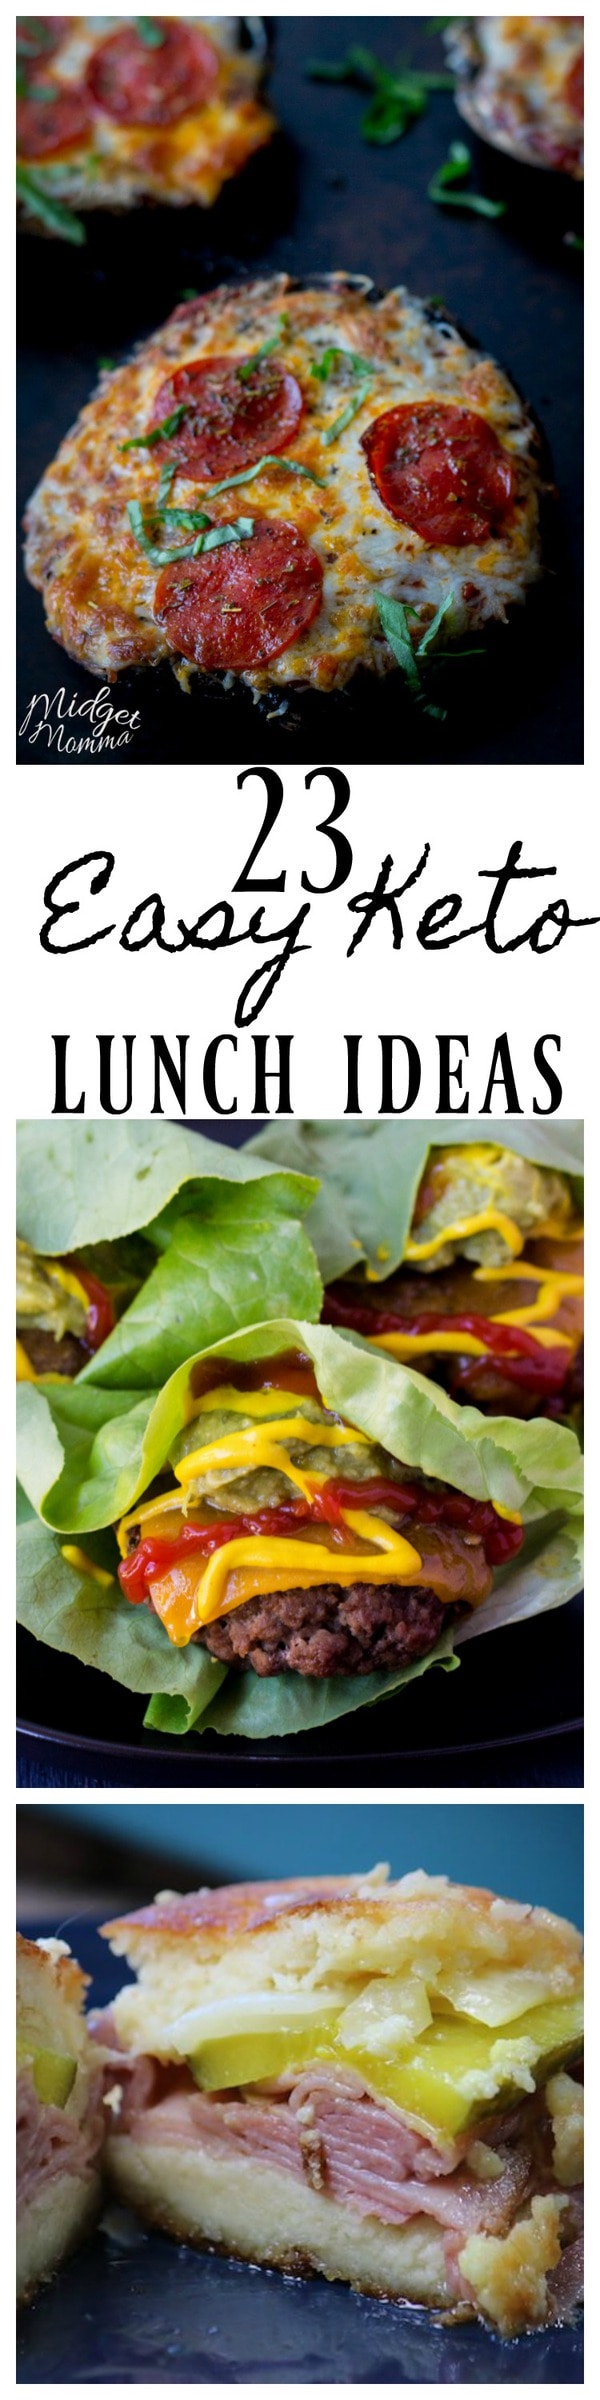 23 Easy Keto Lunch Ideas- Easy and super tasty lunch ideas that are keto friendly. #EasyKeto #keto #KetoLunch #KetoRecipes